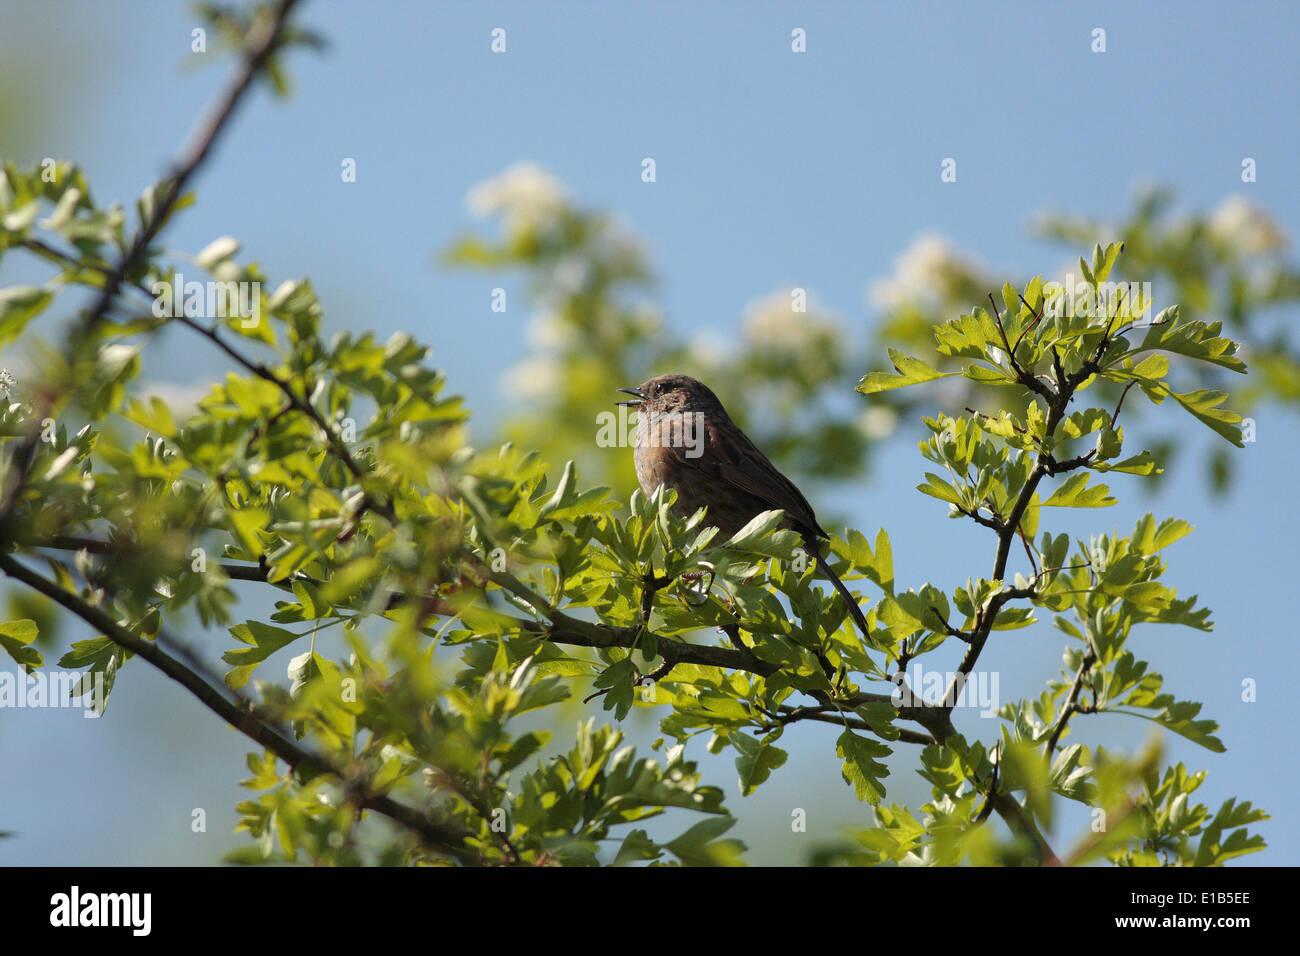 Hedge Sparrow Dunnock prunella modularis song birds songster Irish UK European hedgerow birds garden birds hawthorn white thorn - Stock Image